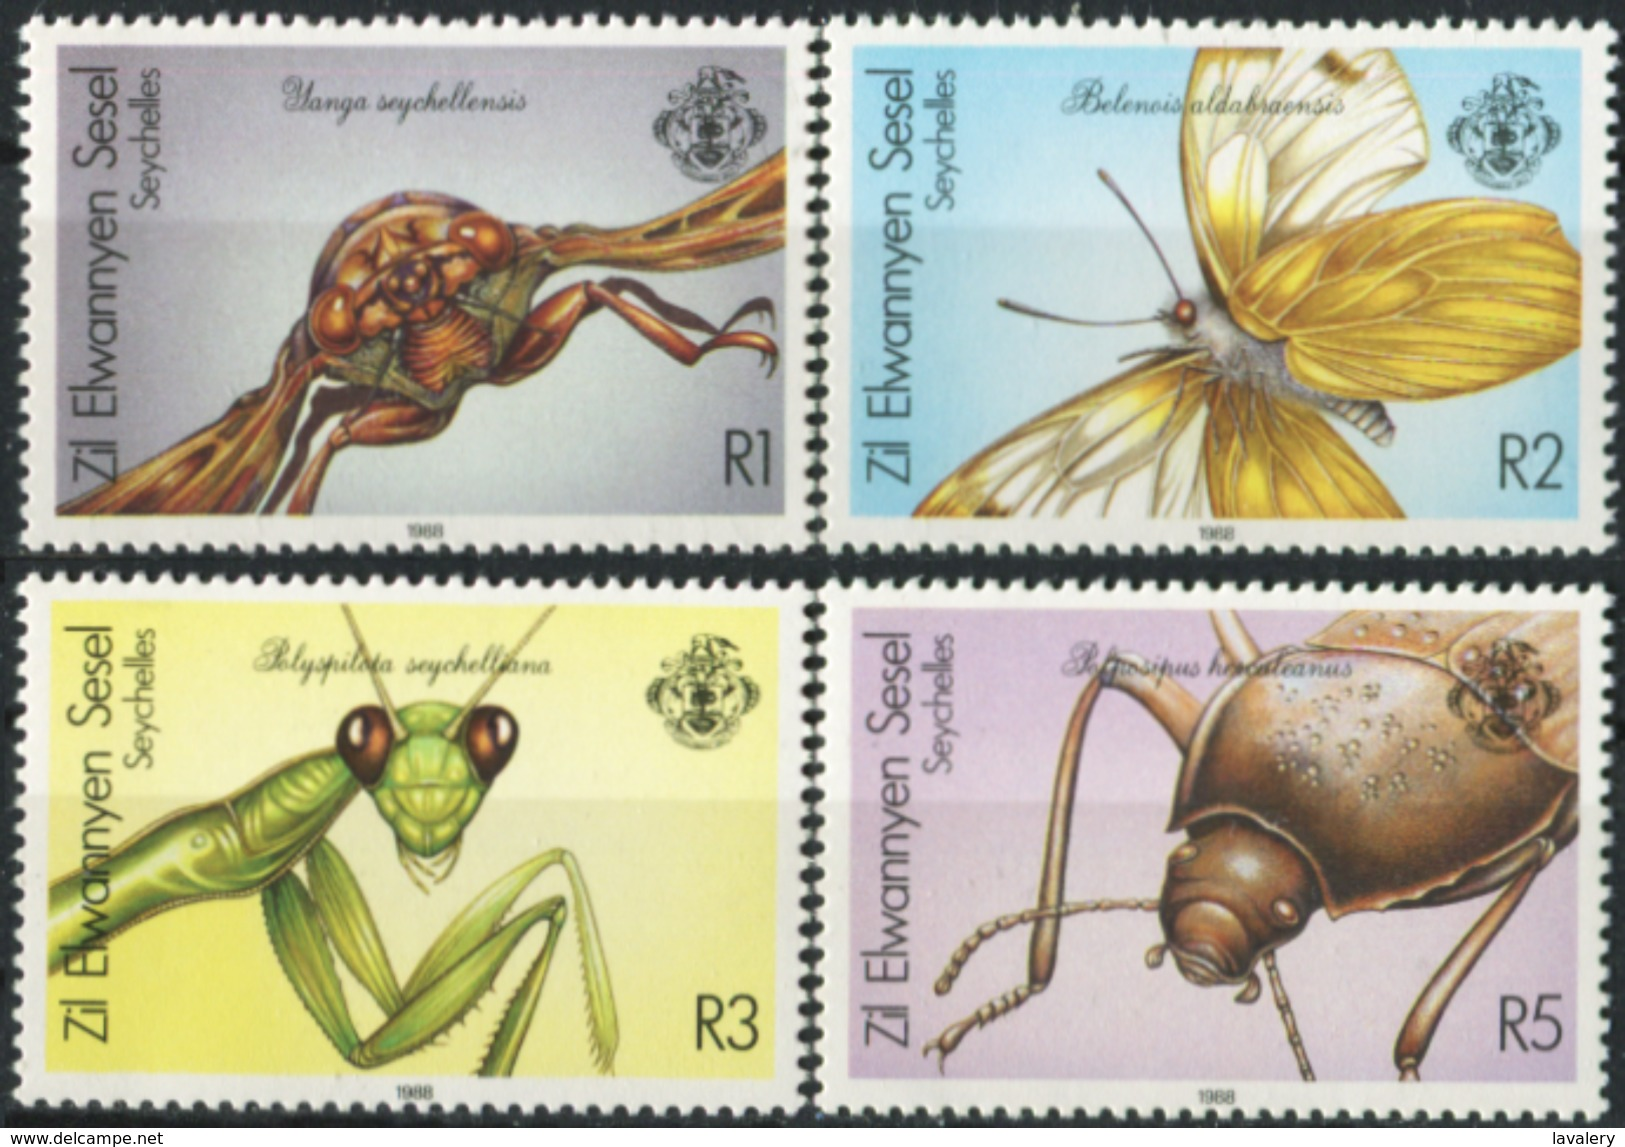 SEYCHELLES 1988 Zil Elwannyen Sesel, Insects, Butterfly, Fauna MNH - Seychelles (1976-...)